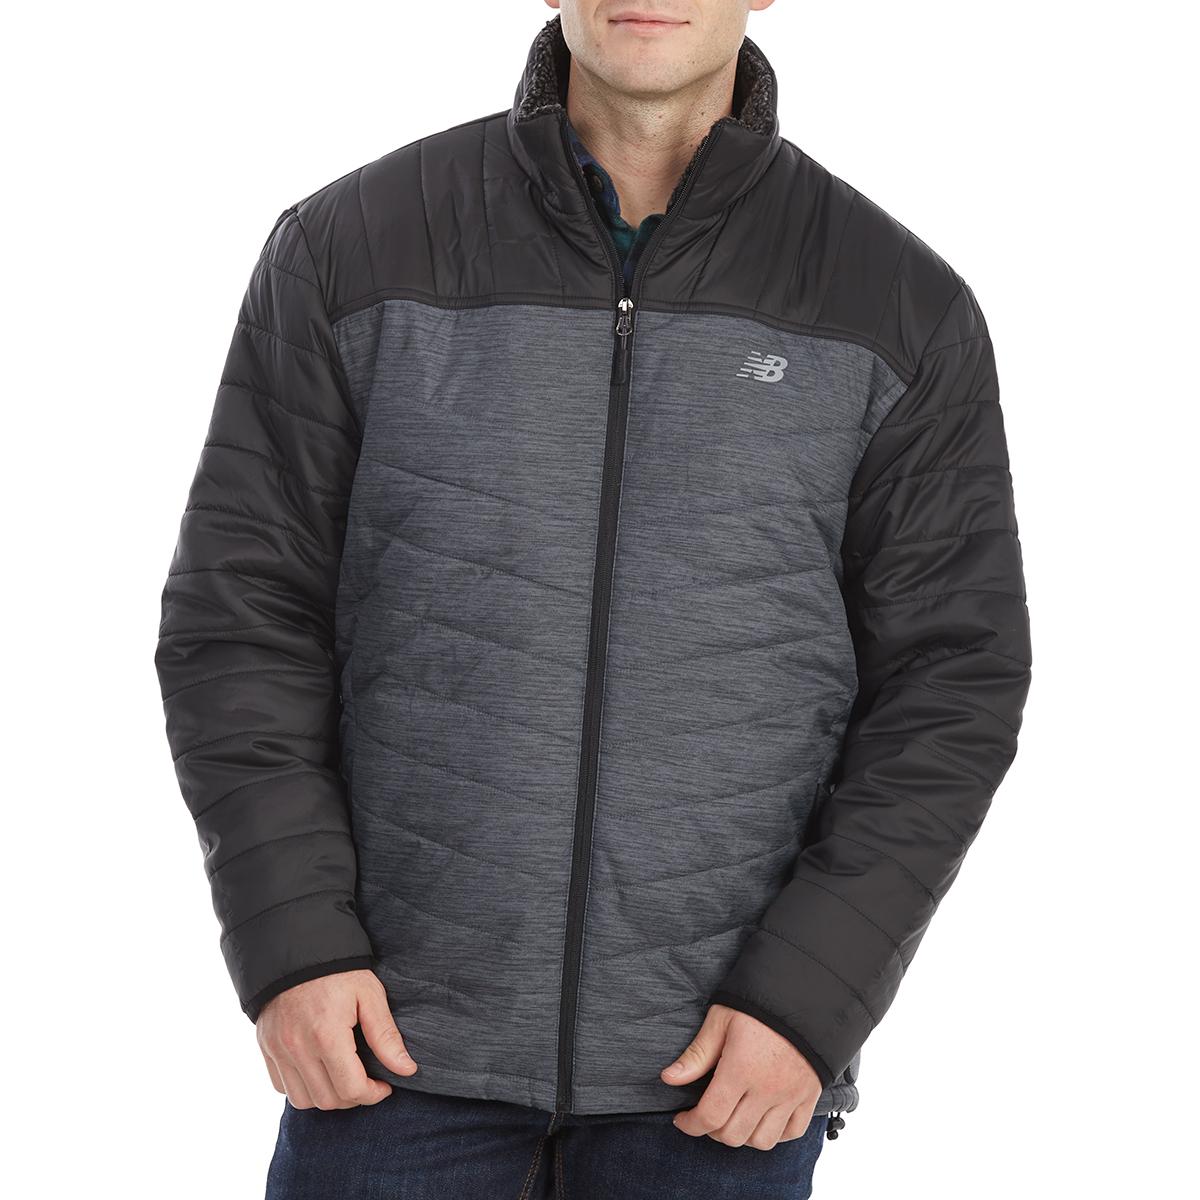 New Balance Men's Sherpa-Lined Puffer Jacket - Black, XXL